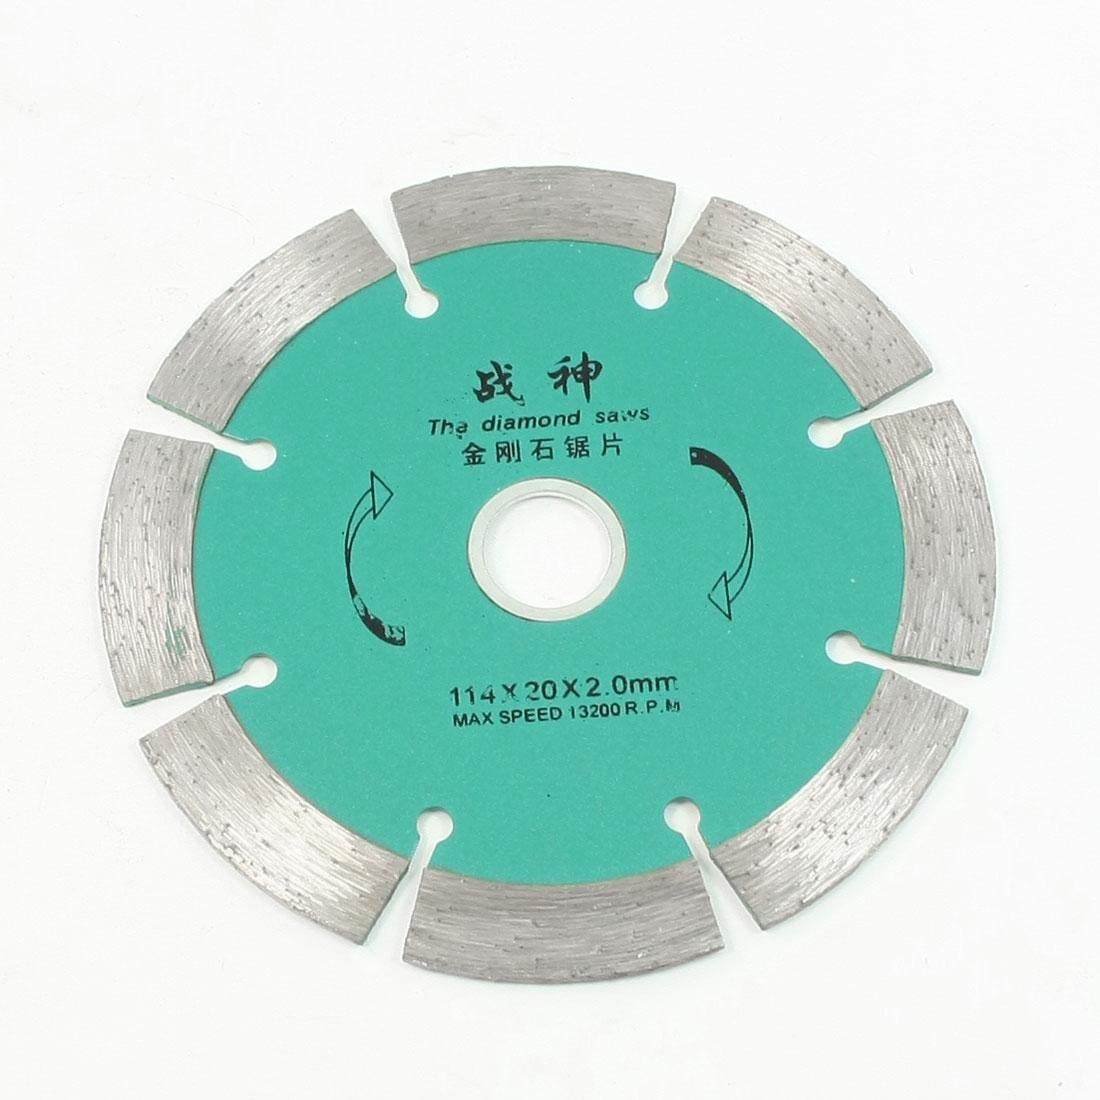 Circular Crack Disc Diamond Saw Cutting Slice 114mm x 20mm x 2mm